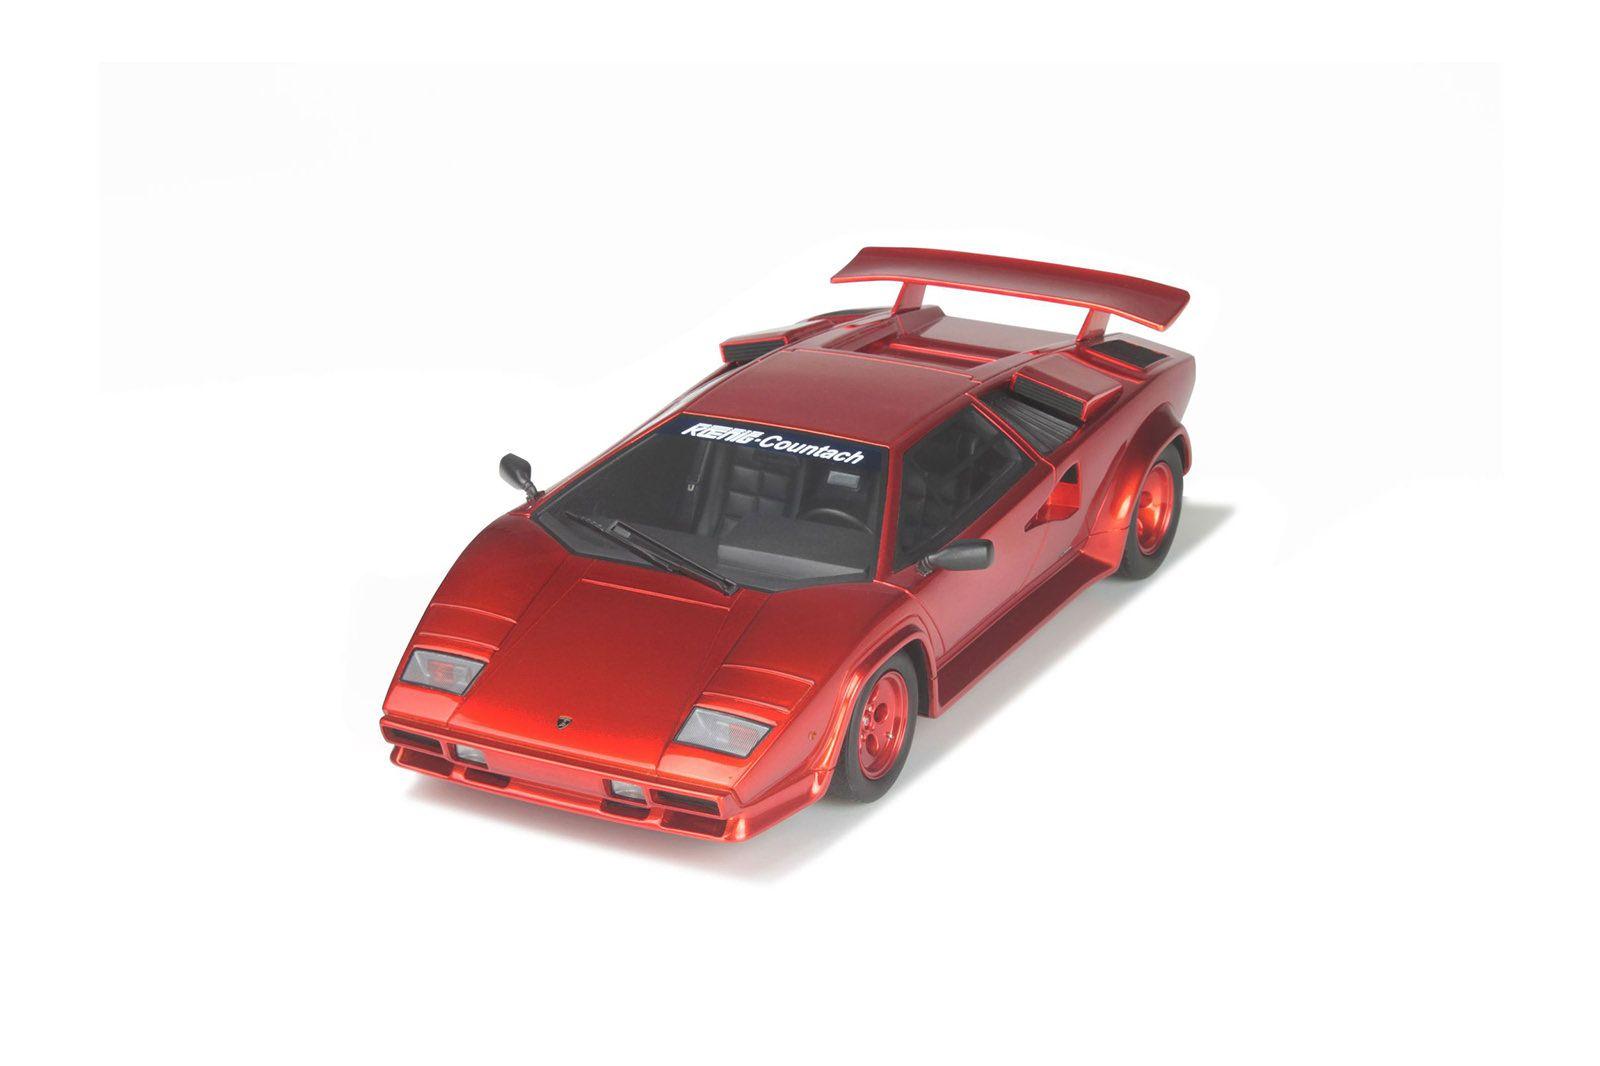 Model Car - 1:18 KOENIN Countach Special #967/1750